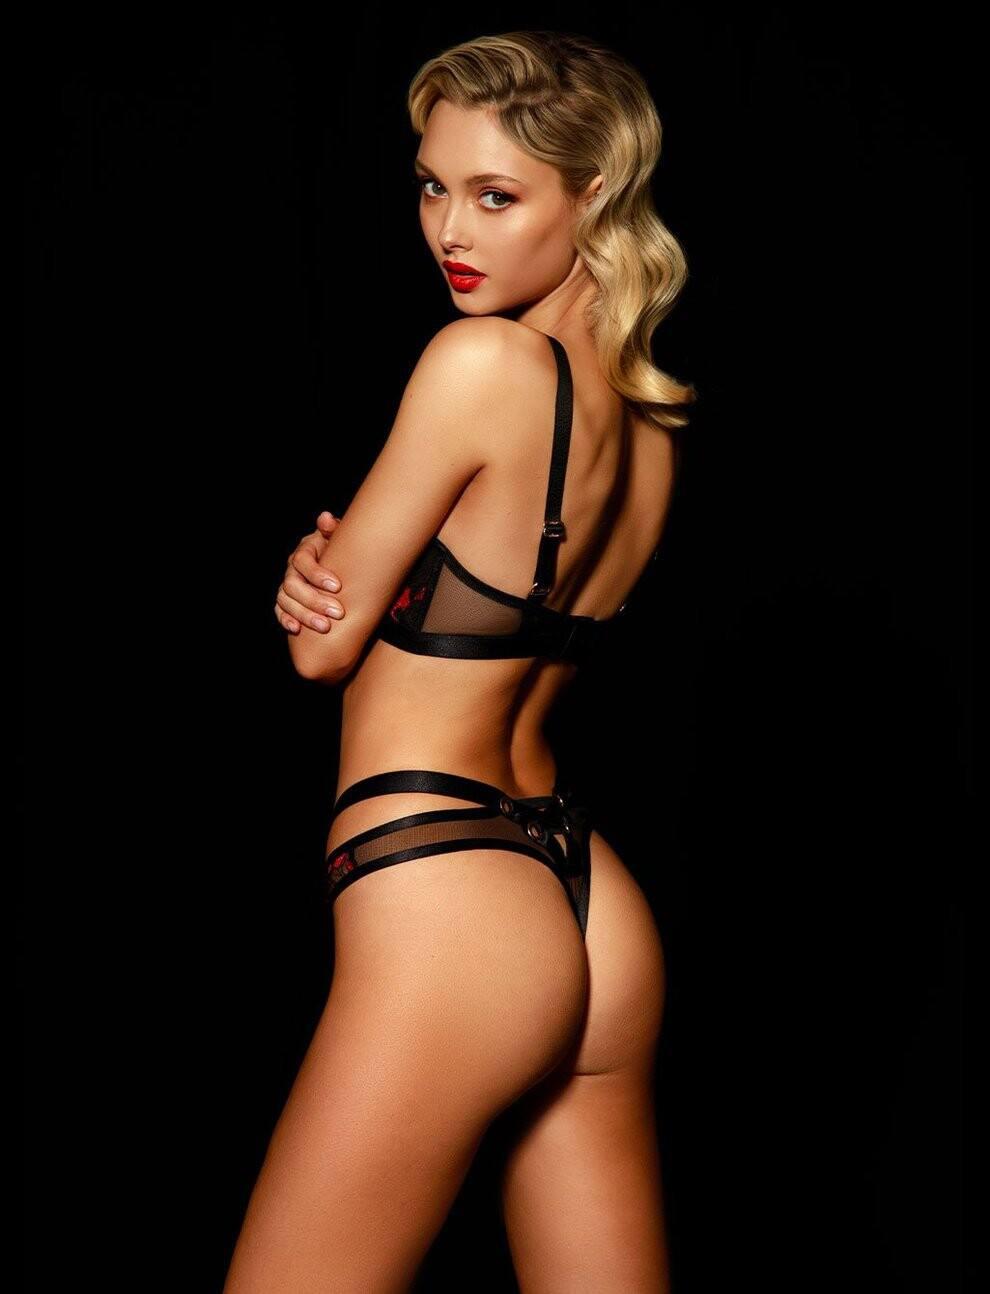 Chloe Avenaim Sexy Lingerie